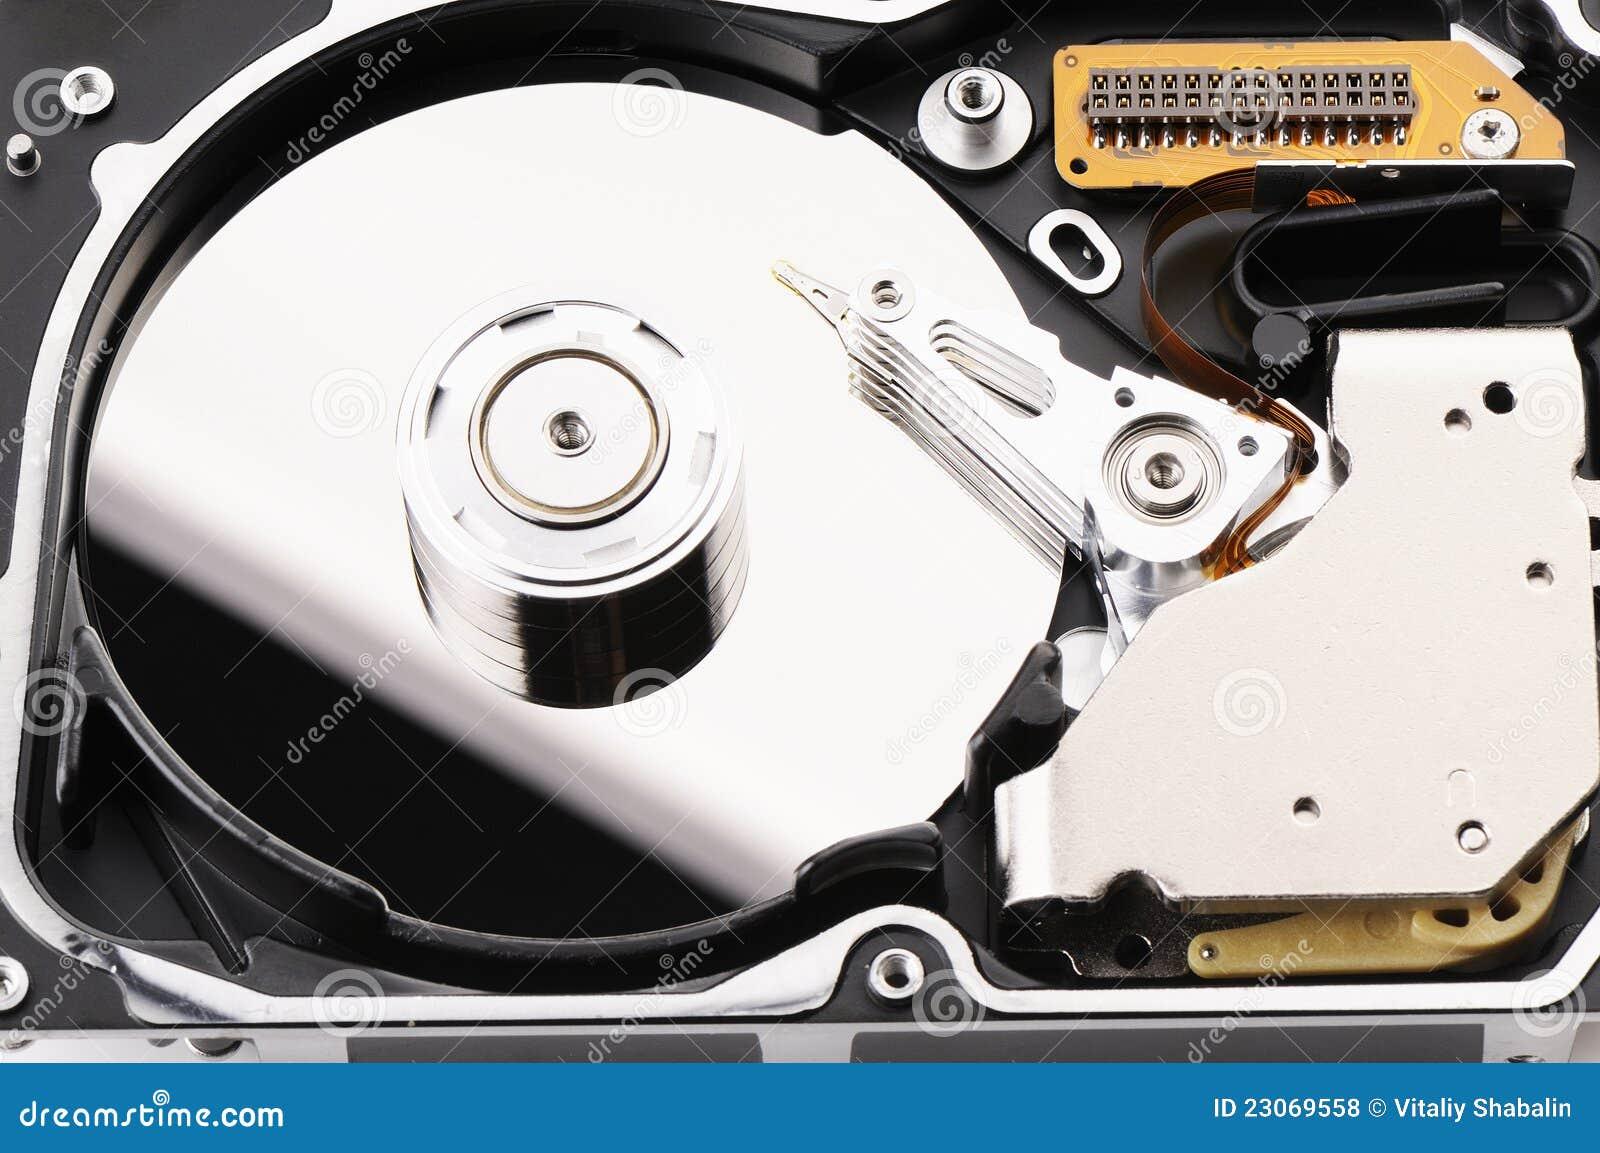 how to take apart a hard drive